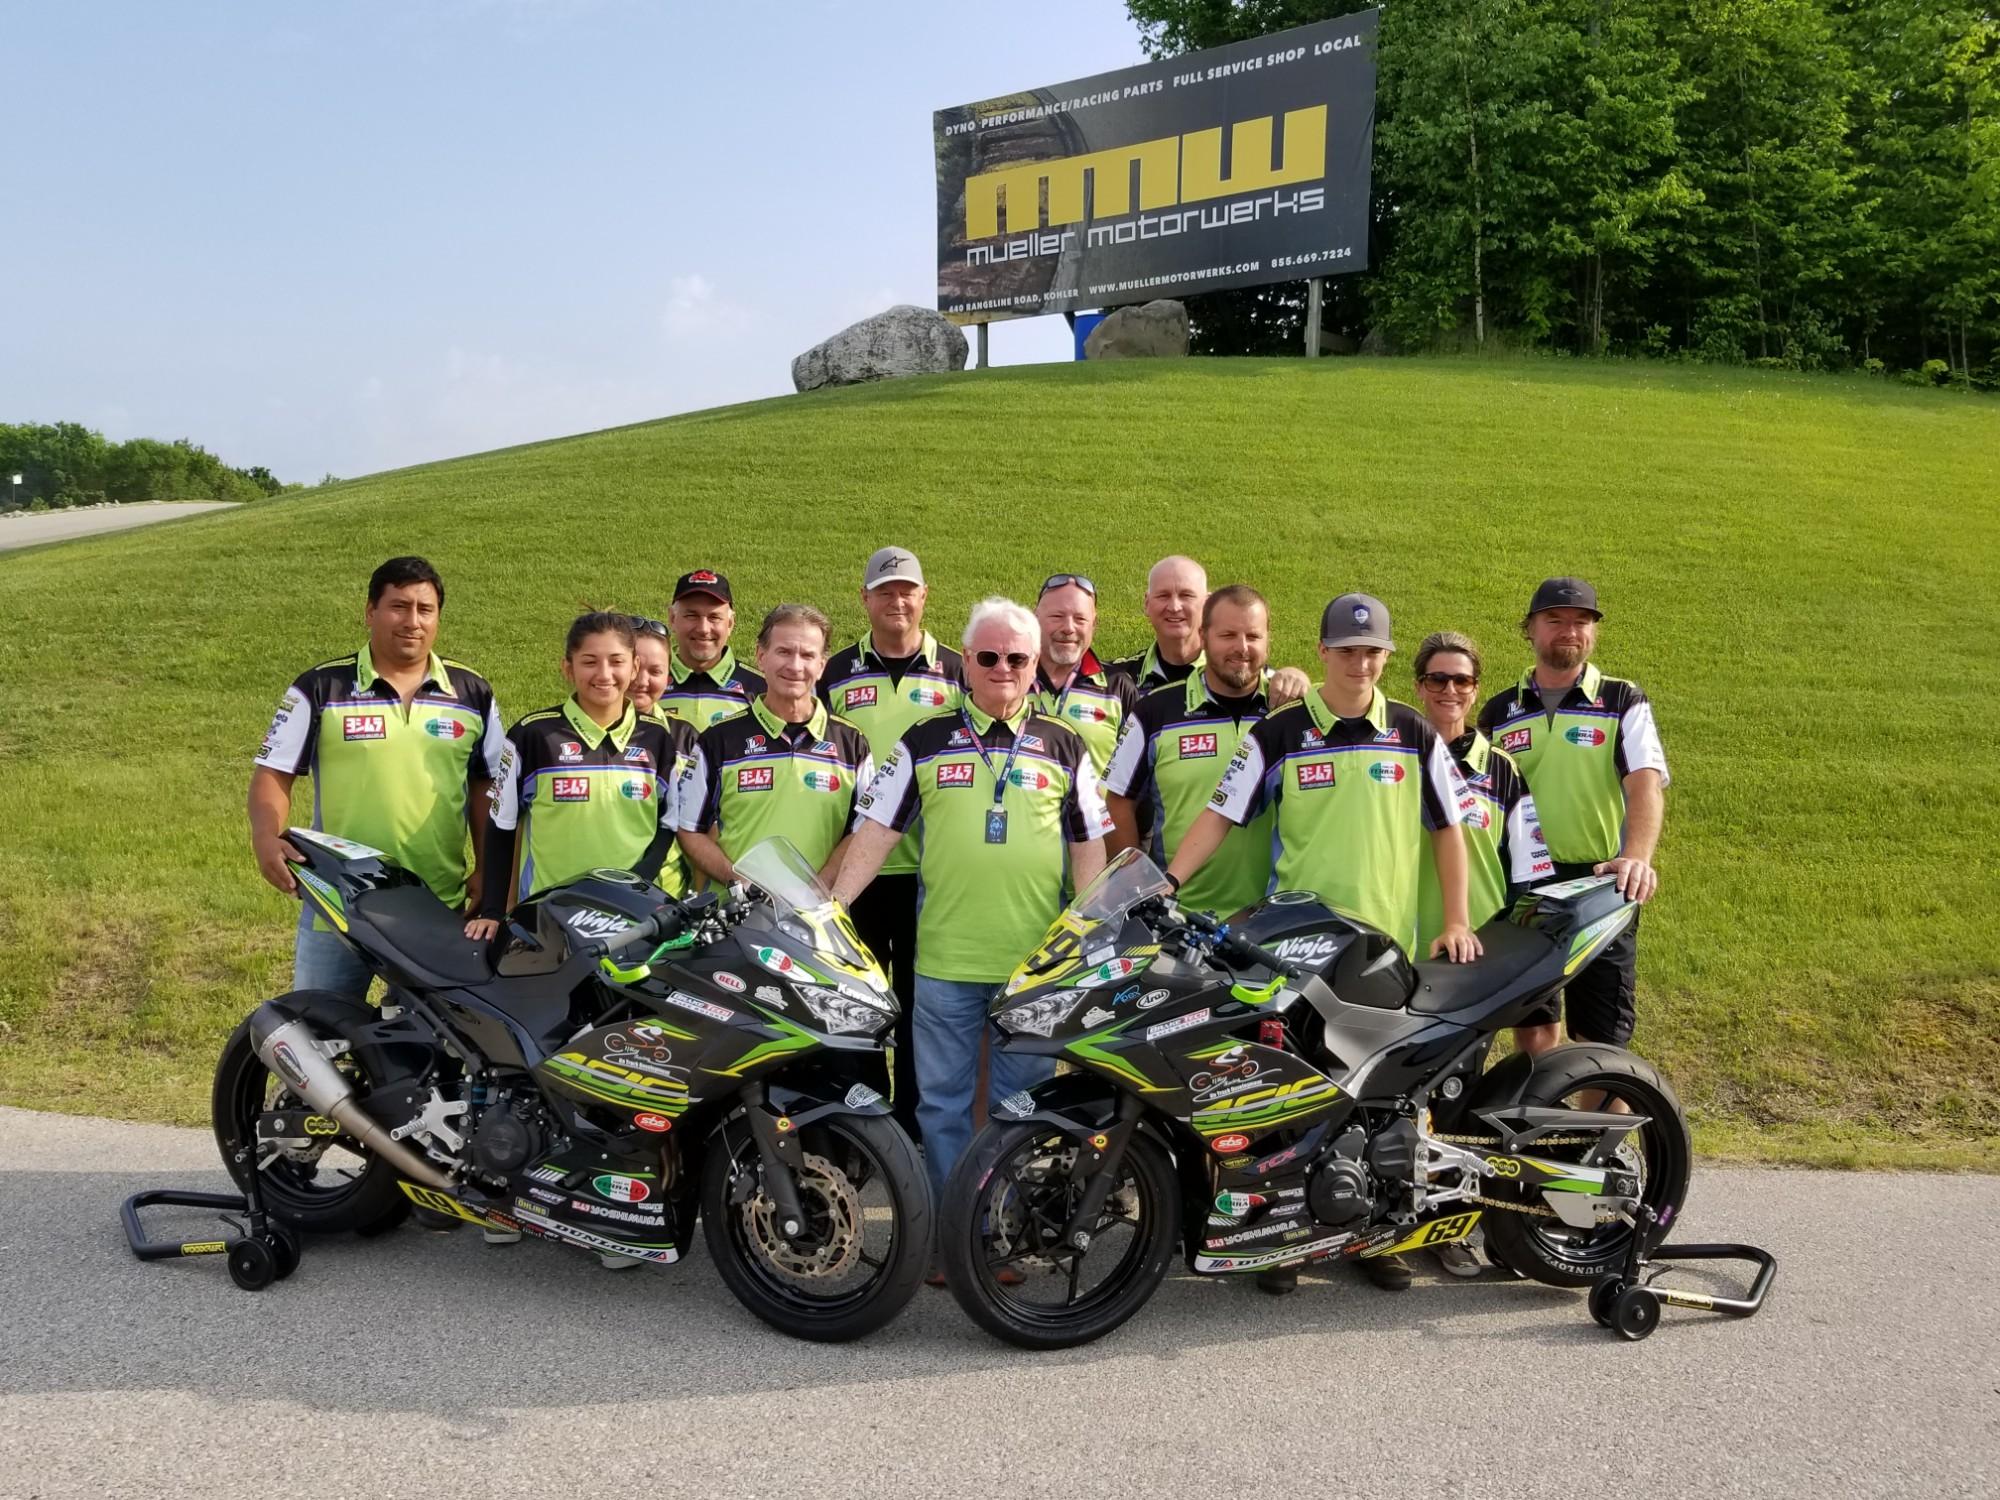 Suzuki Amateur Race Team Photos